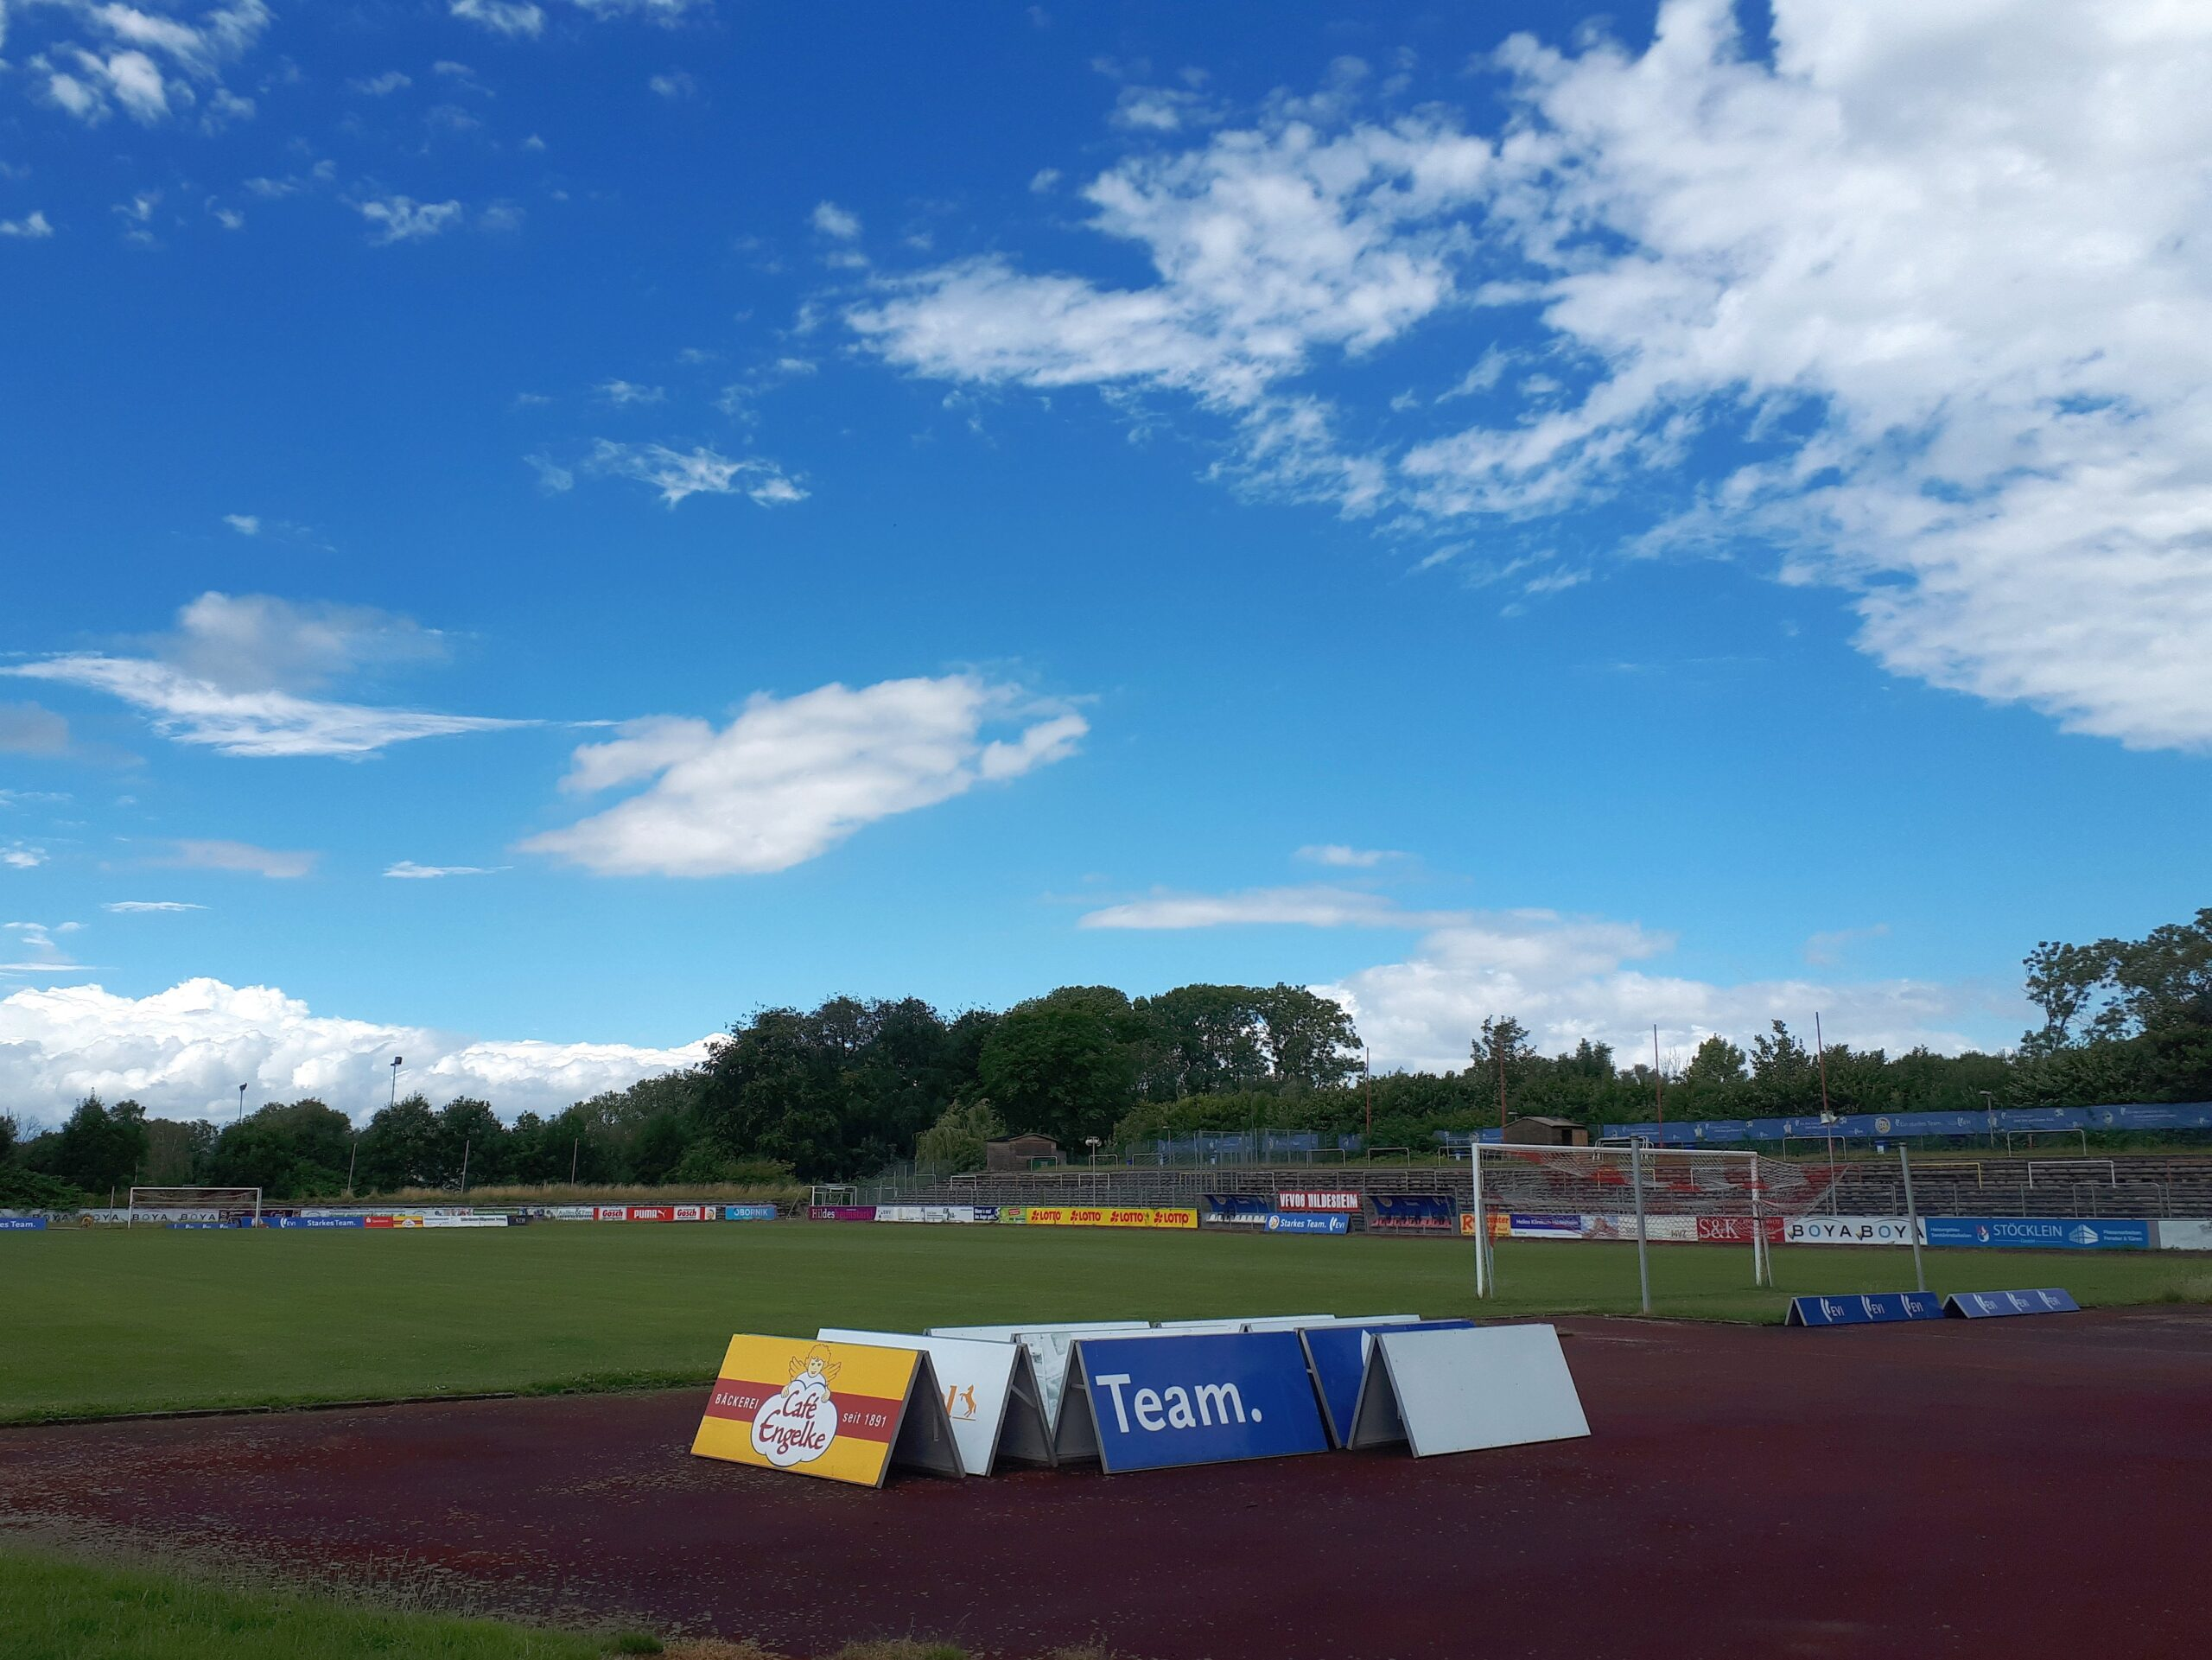 Schon Uwe Seeler lief über den Rasen dieses Stadions